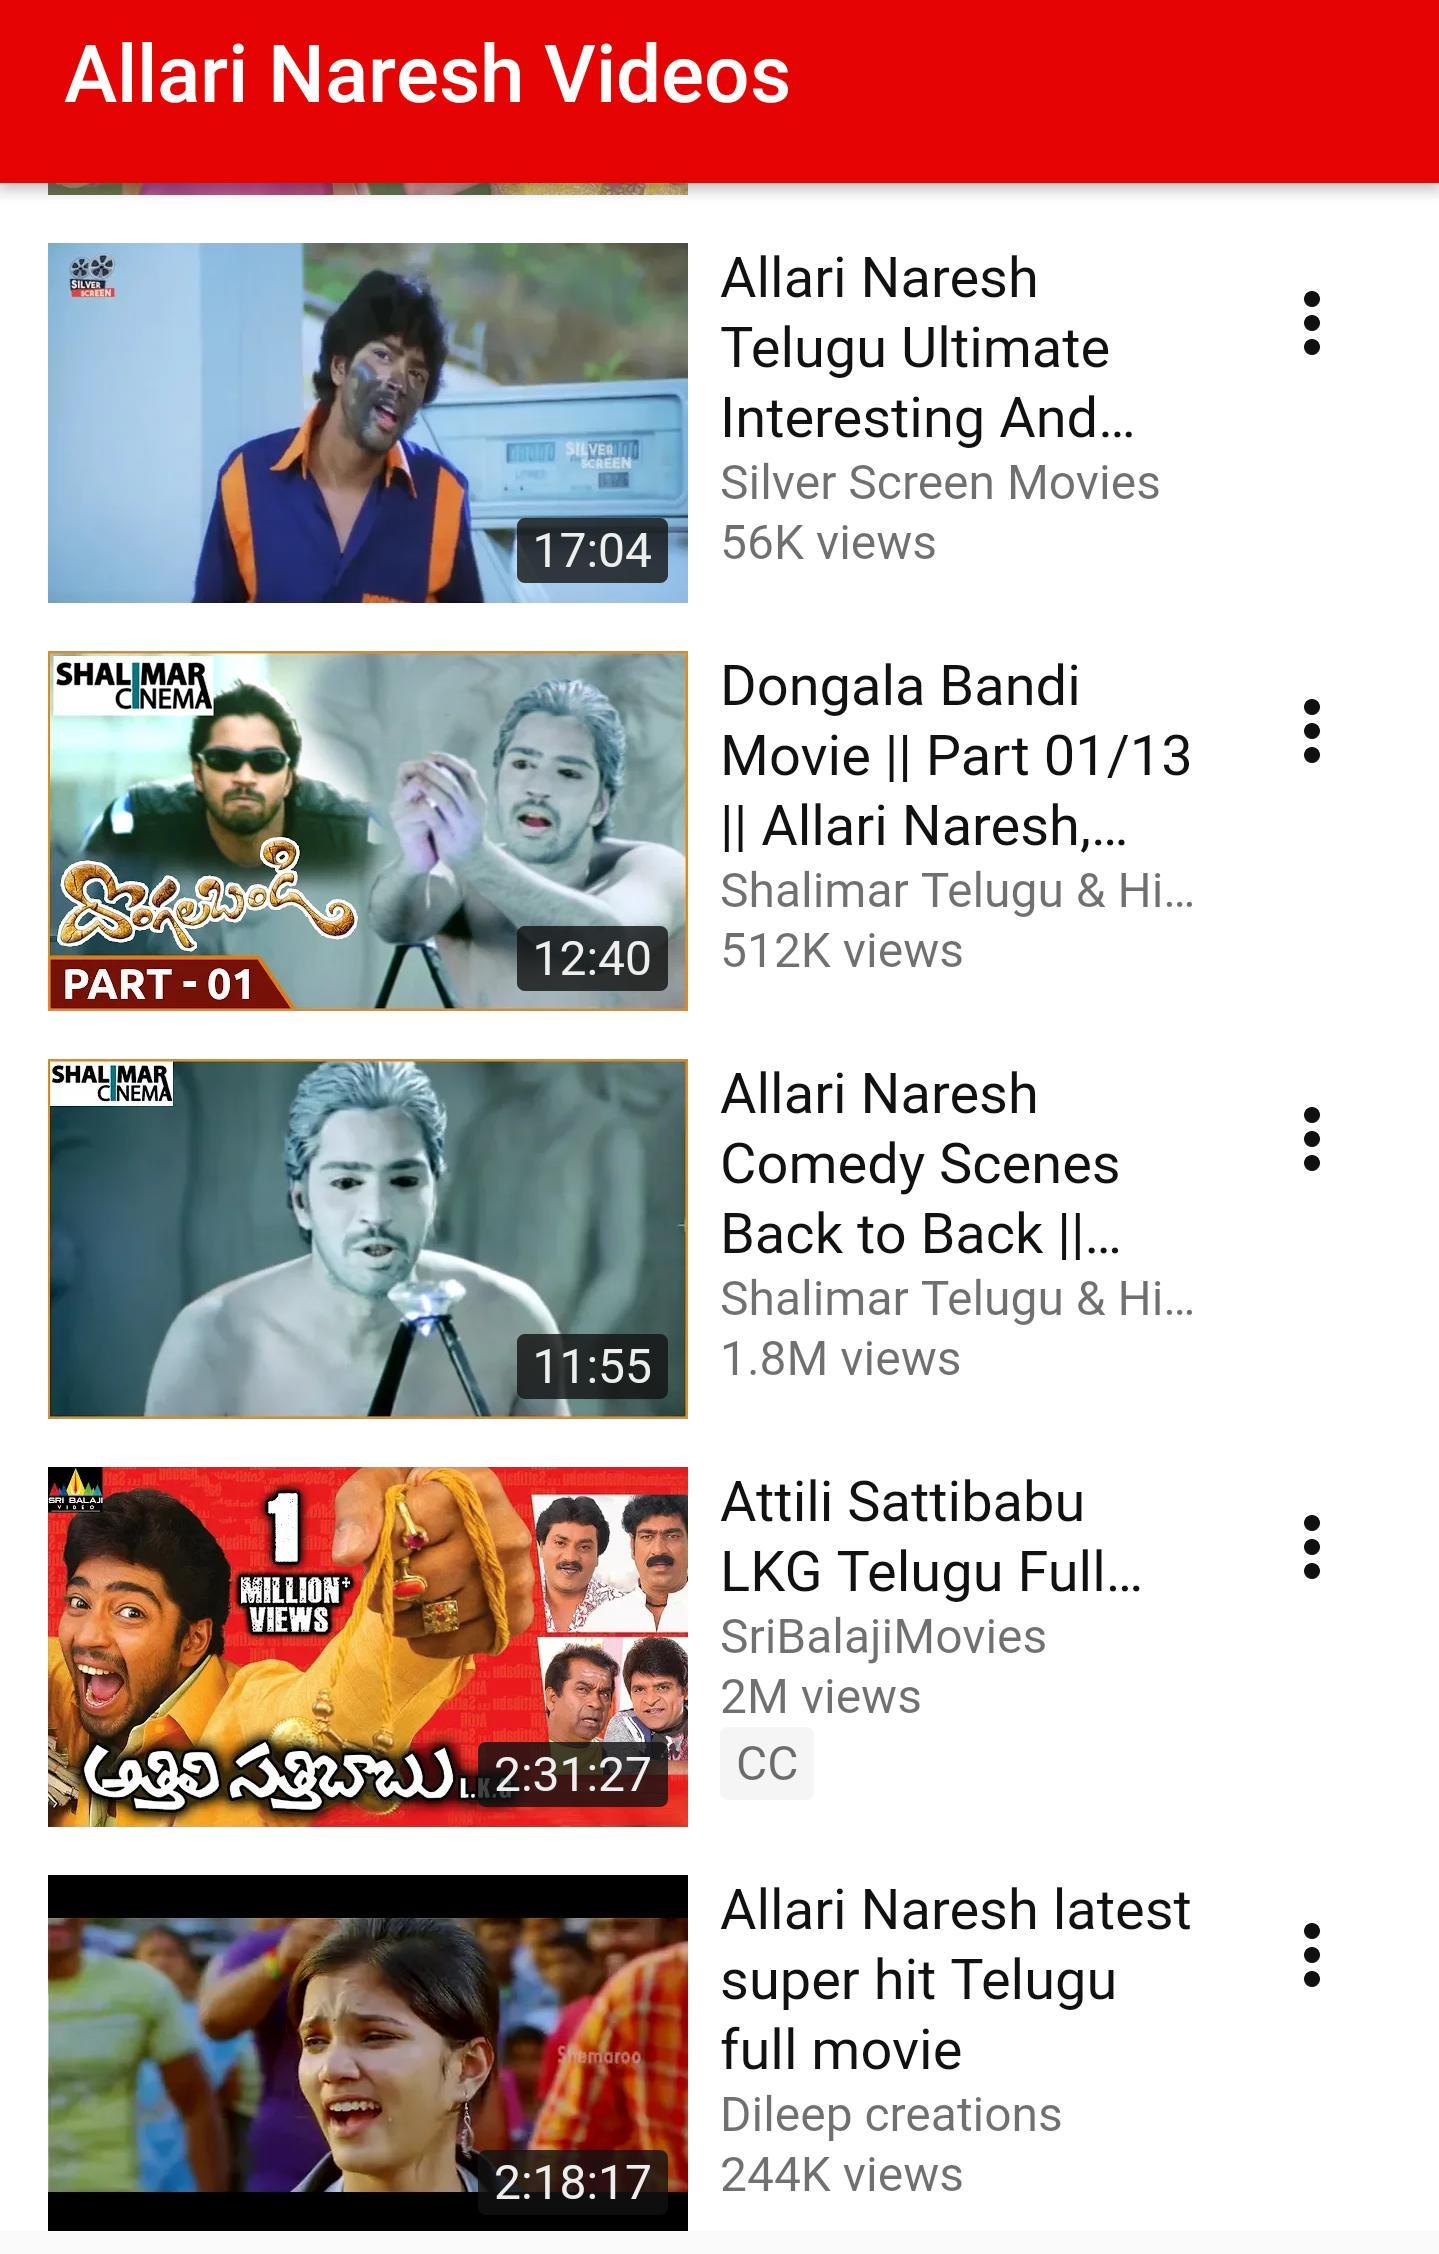 Betting bangaraju youtube converter nhl public betting trends